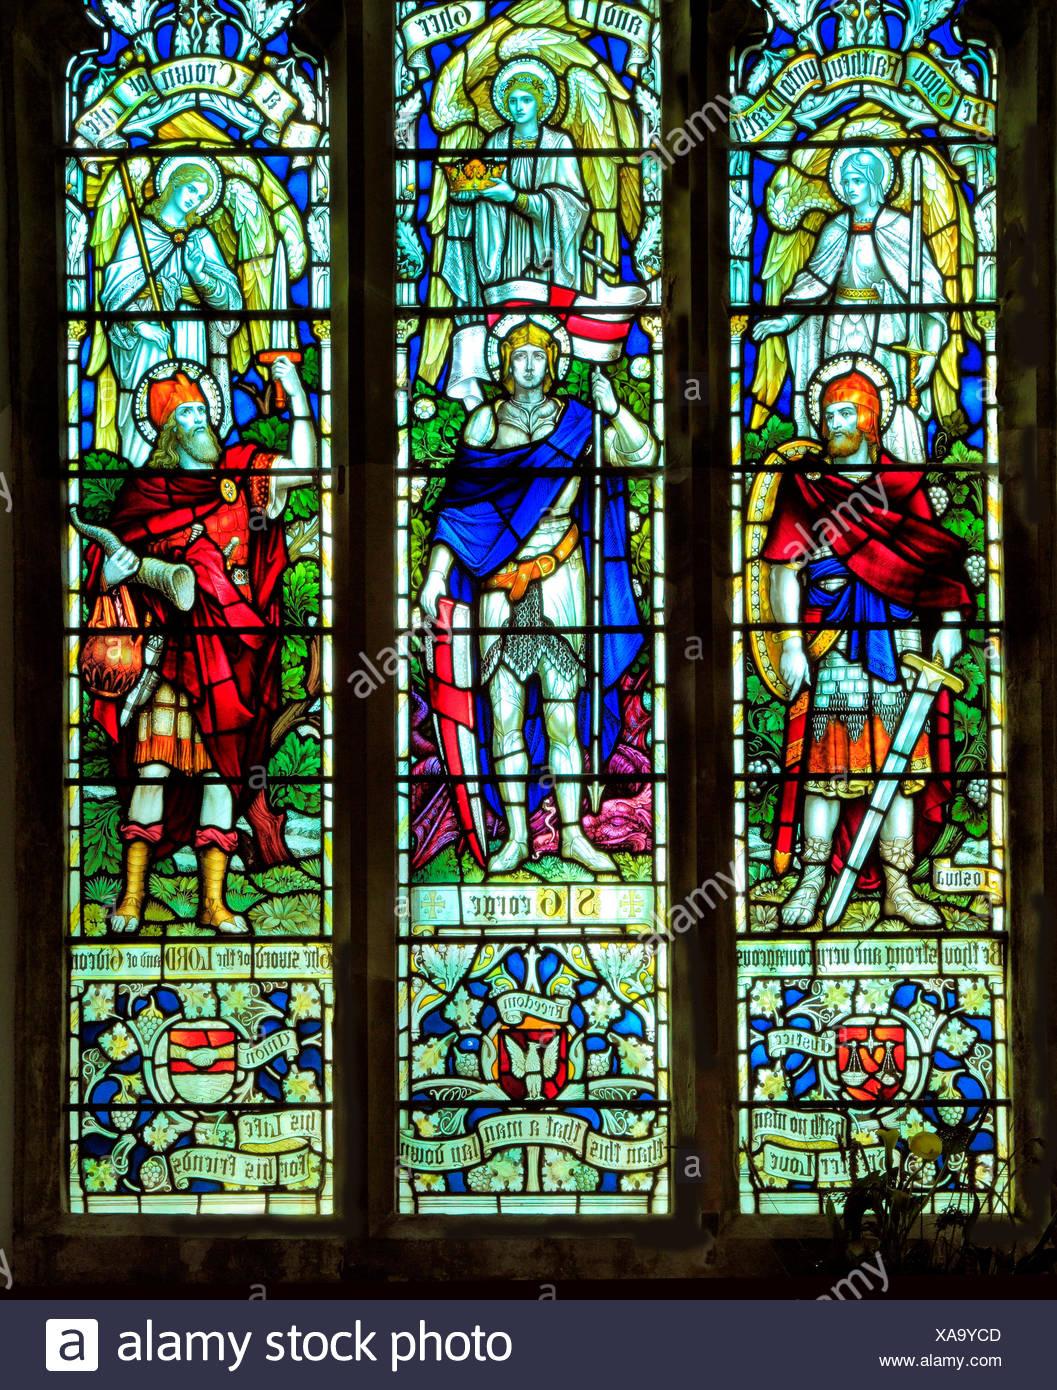 Joshua, St. George, Gideon, stained glass window, All Saints church, Warham, Norfolk, England, UK - Stock Image